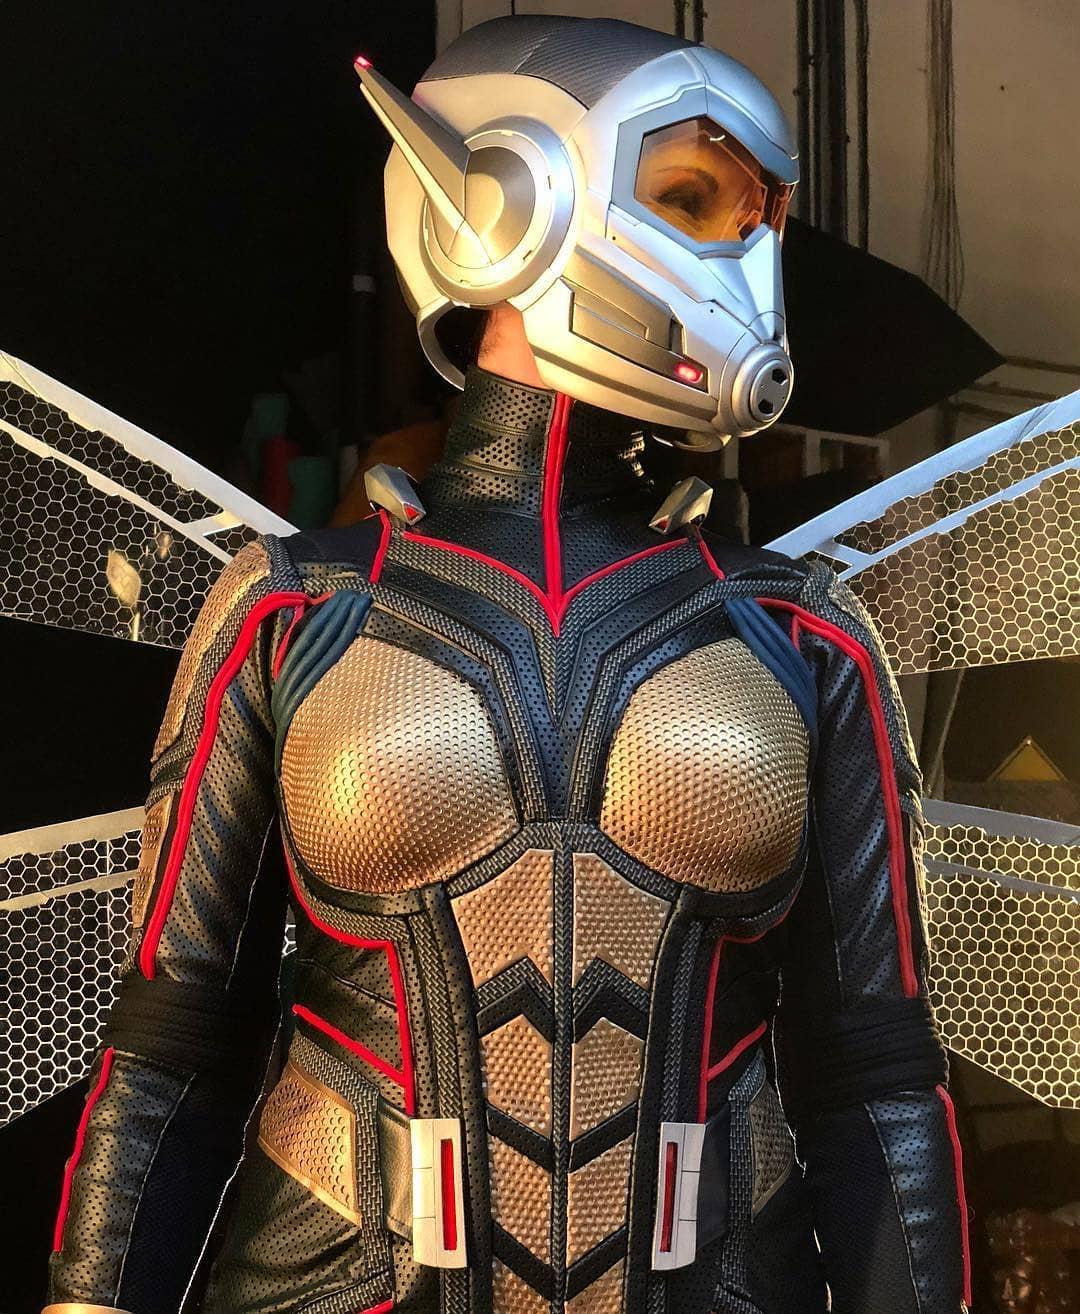 wasp cosplay by downen_creative_studios Helmet by coregeek